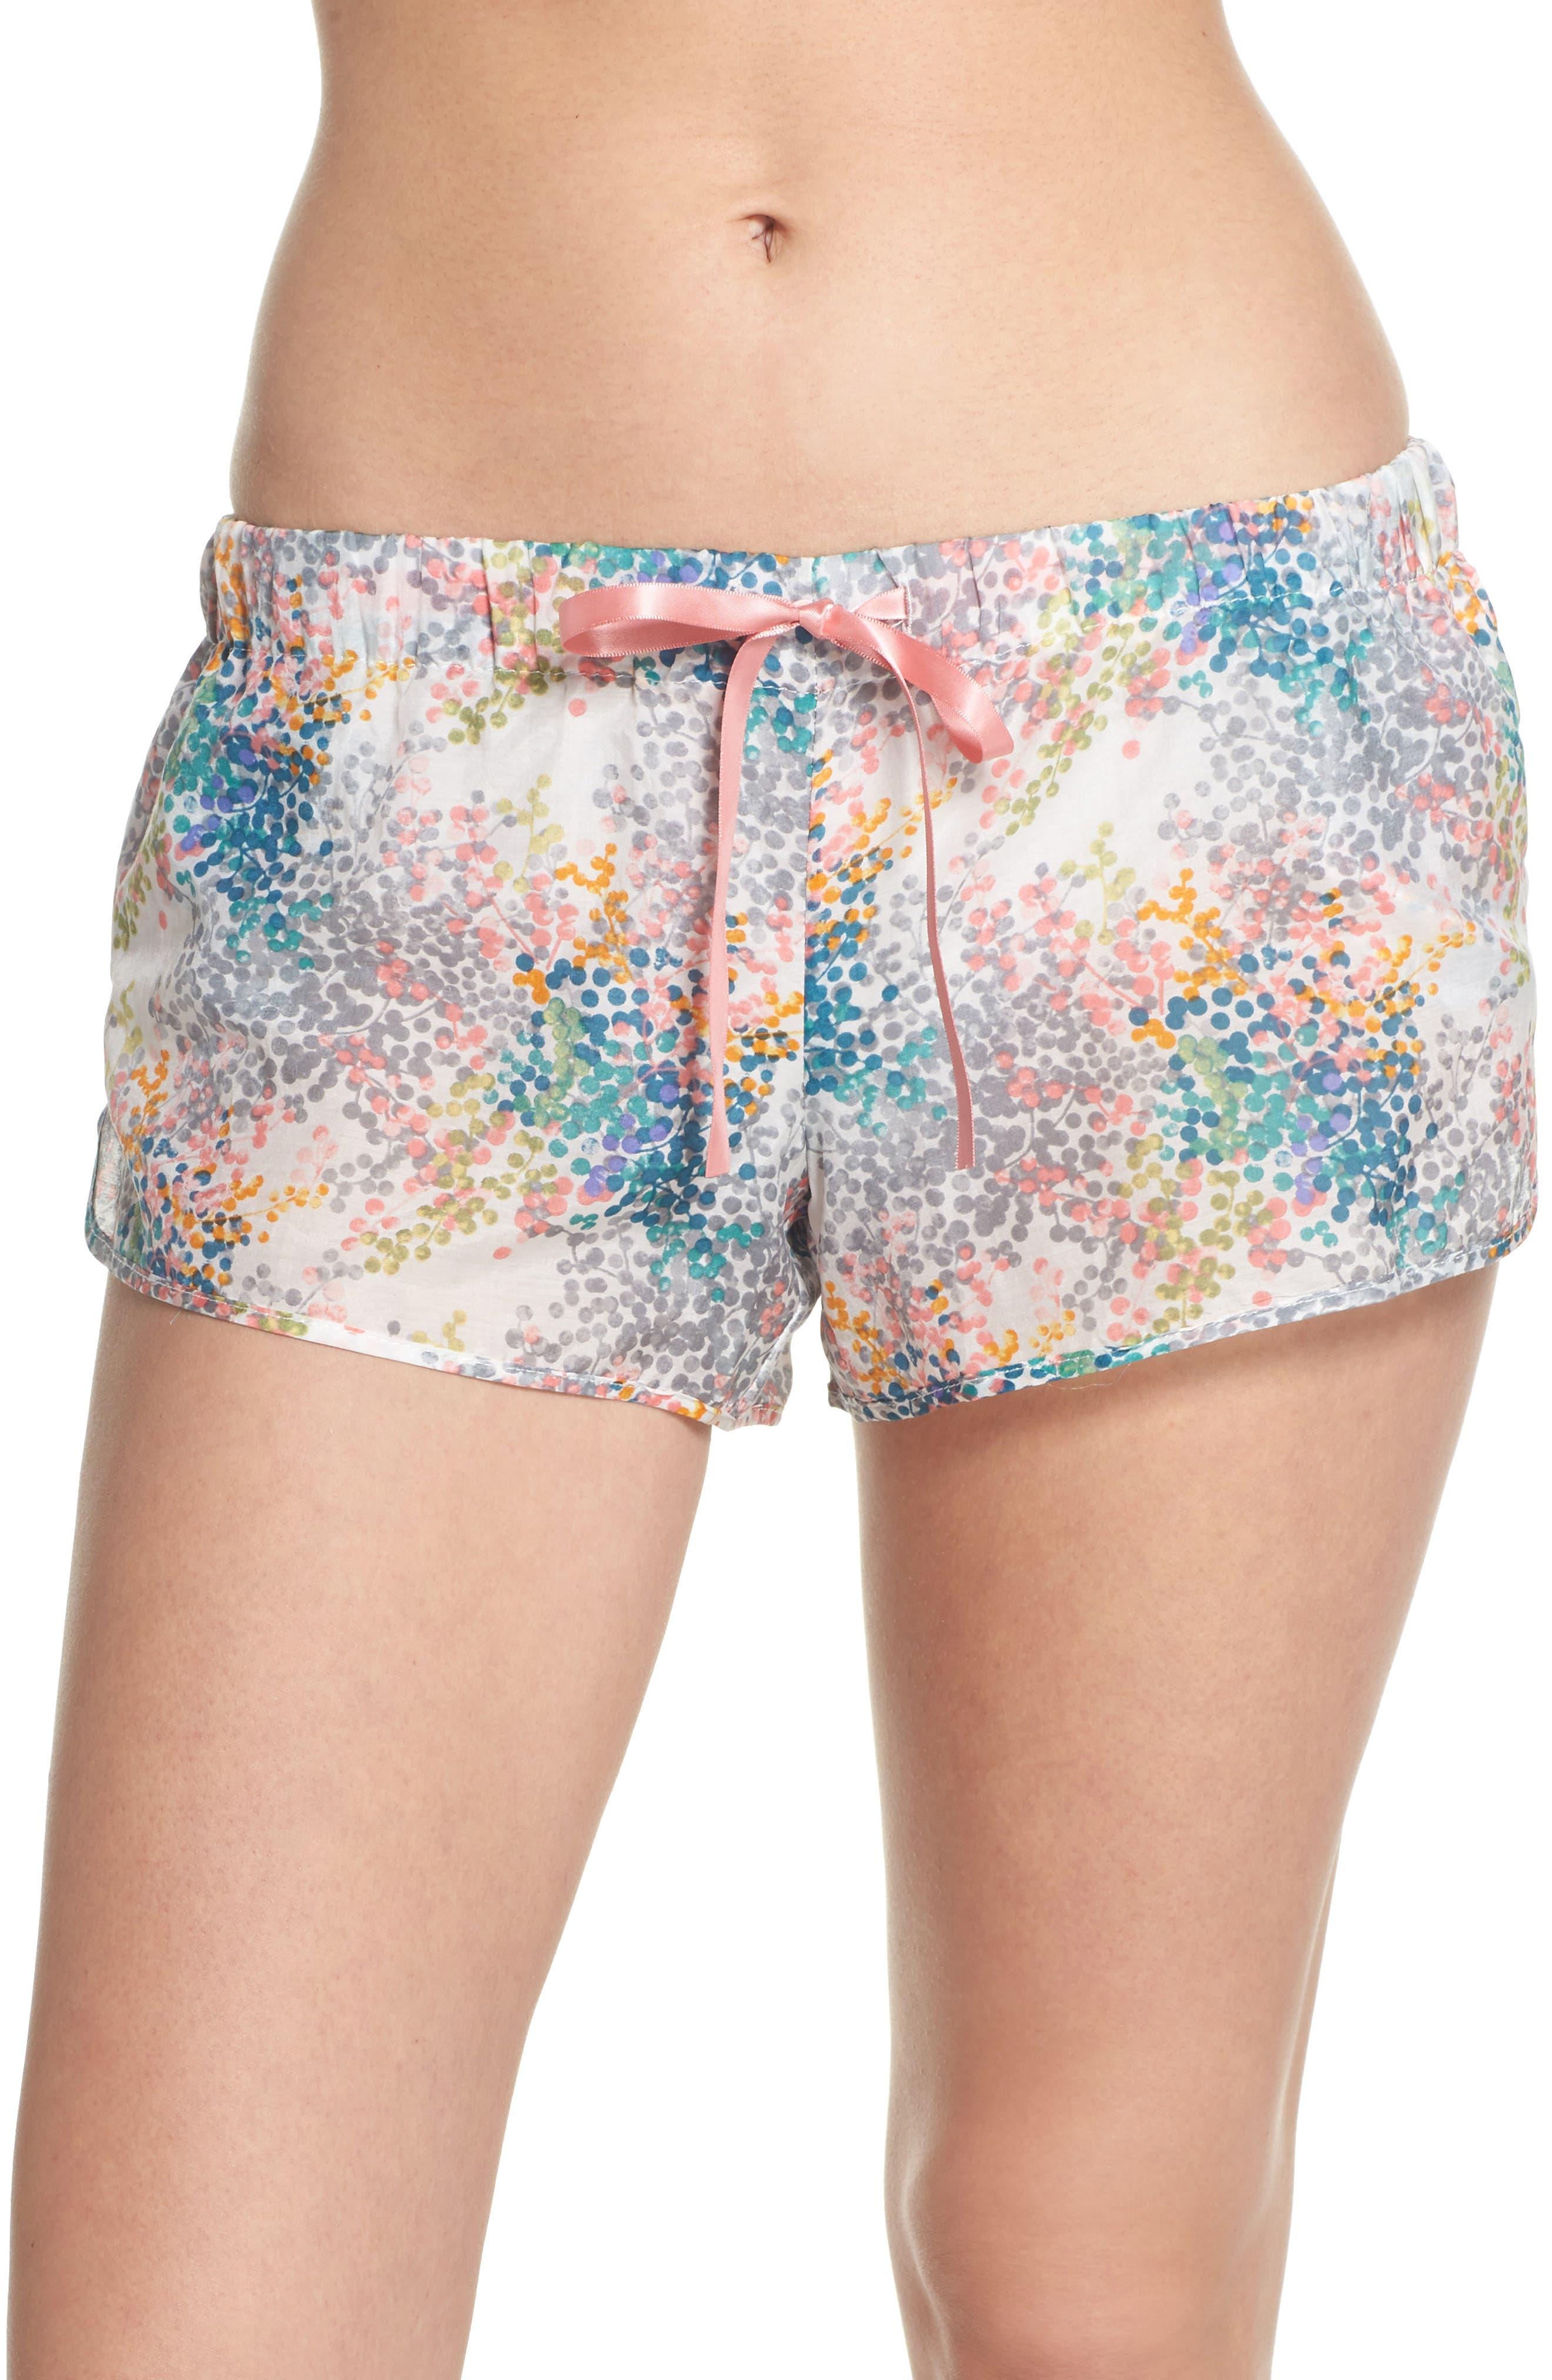 Bouquet Pajama Shorts,                             Main thumbnail 1, color,                             BLUE GREEN